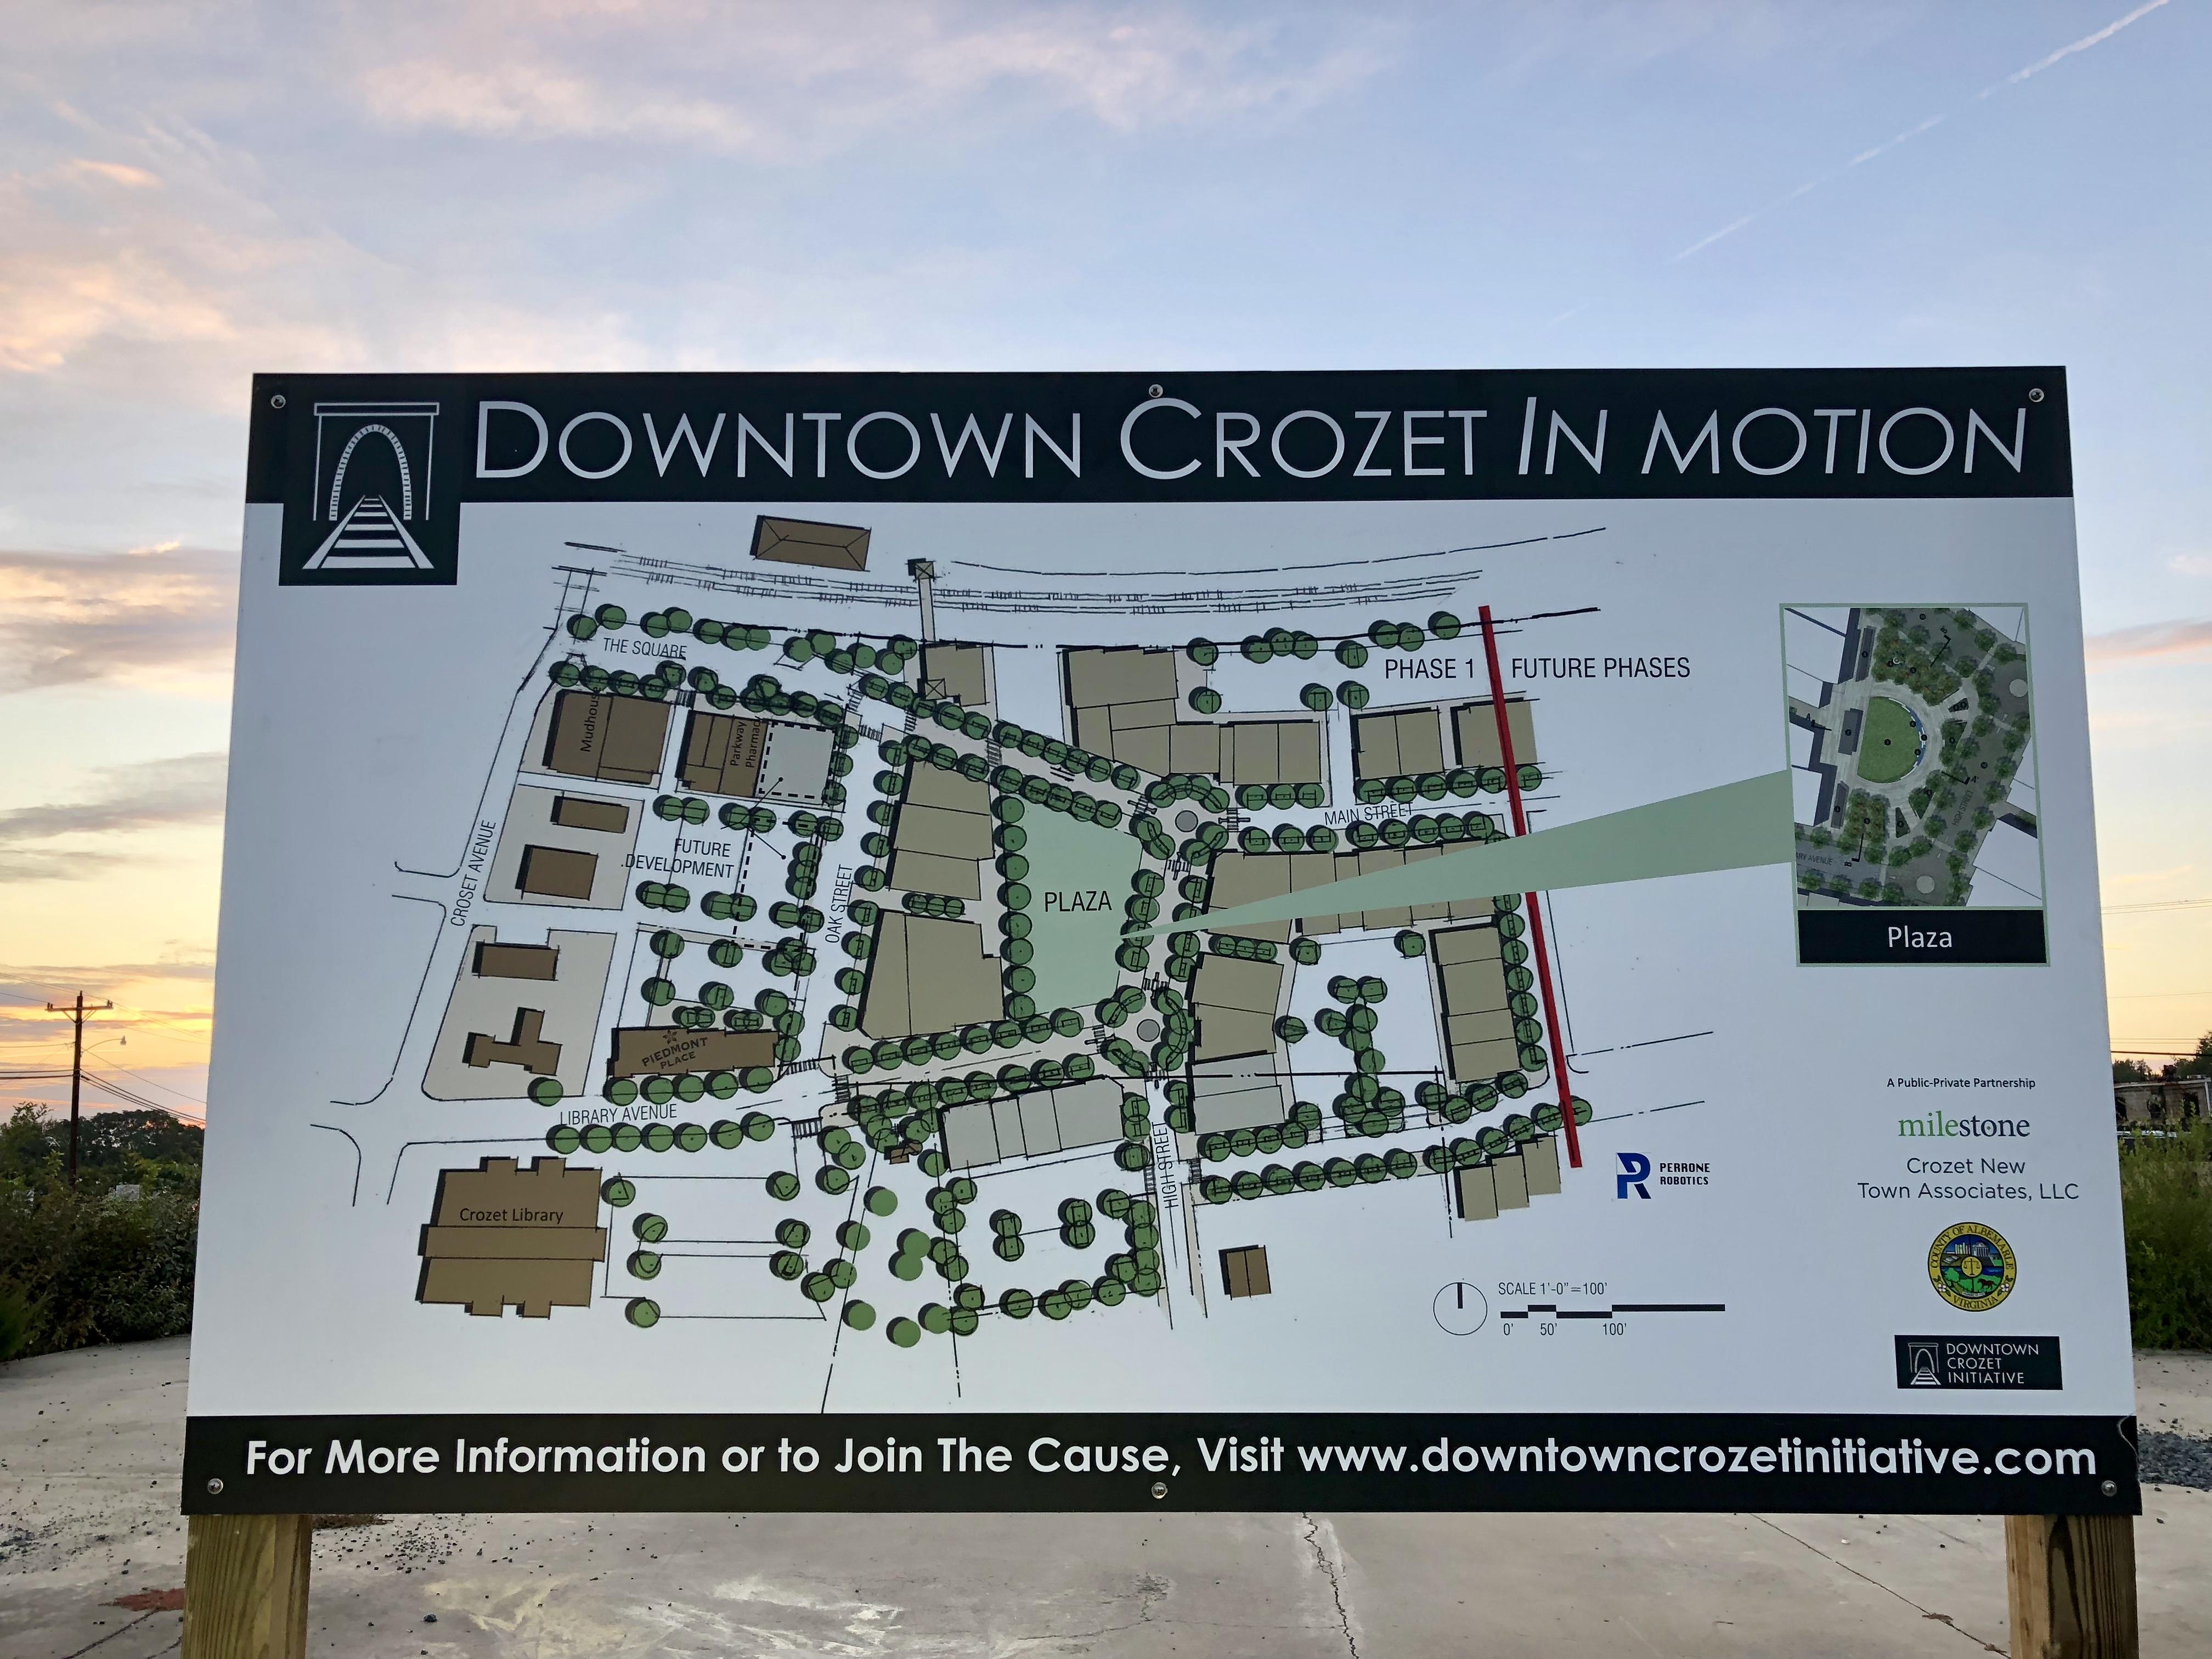 Downtown Crozet Initiative